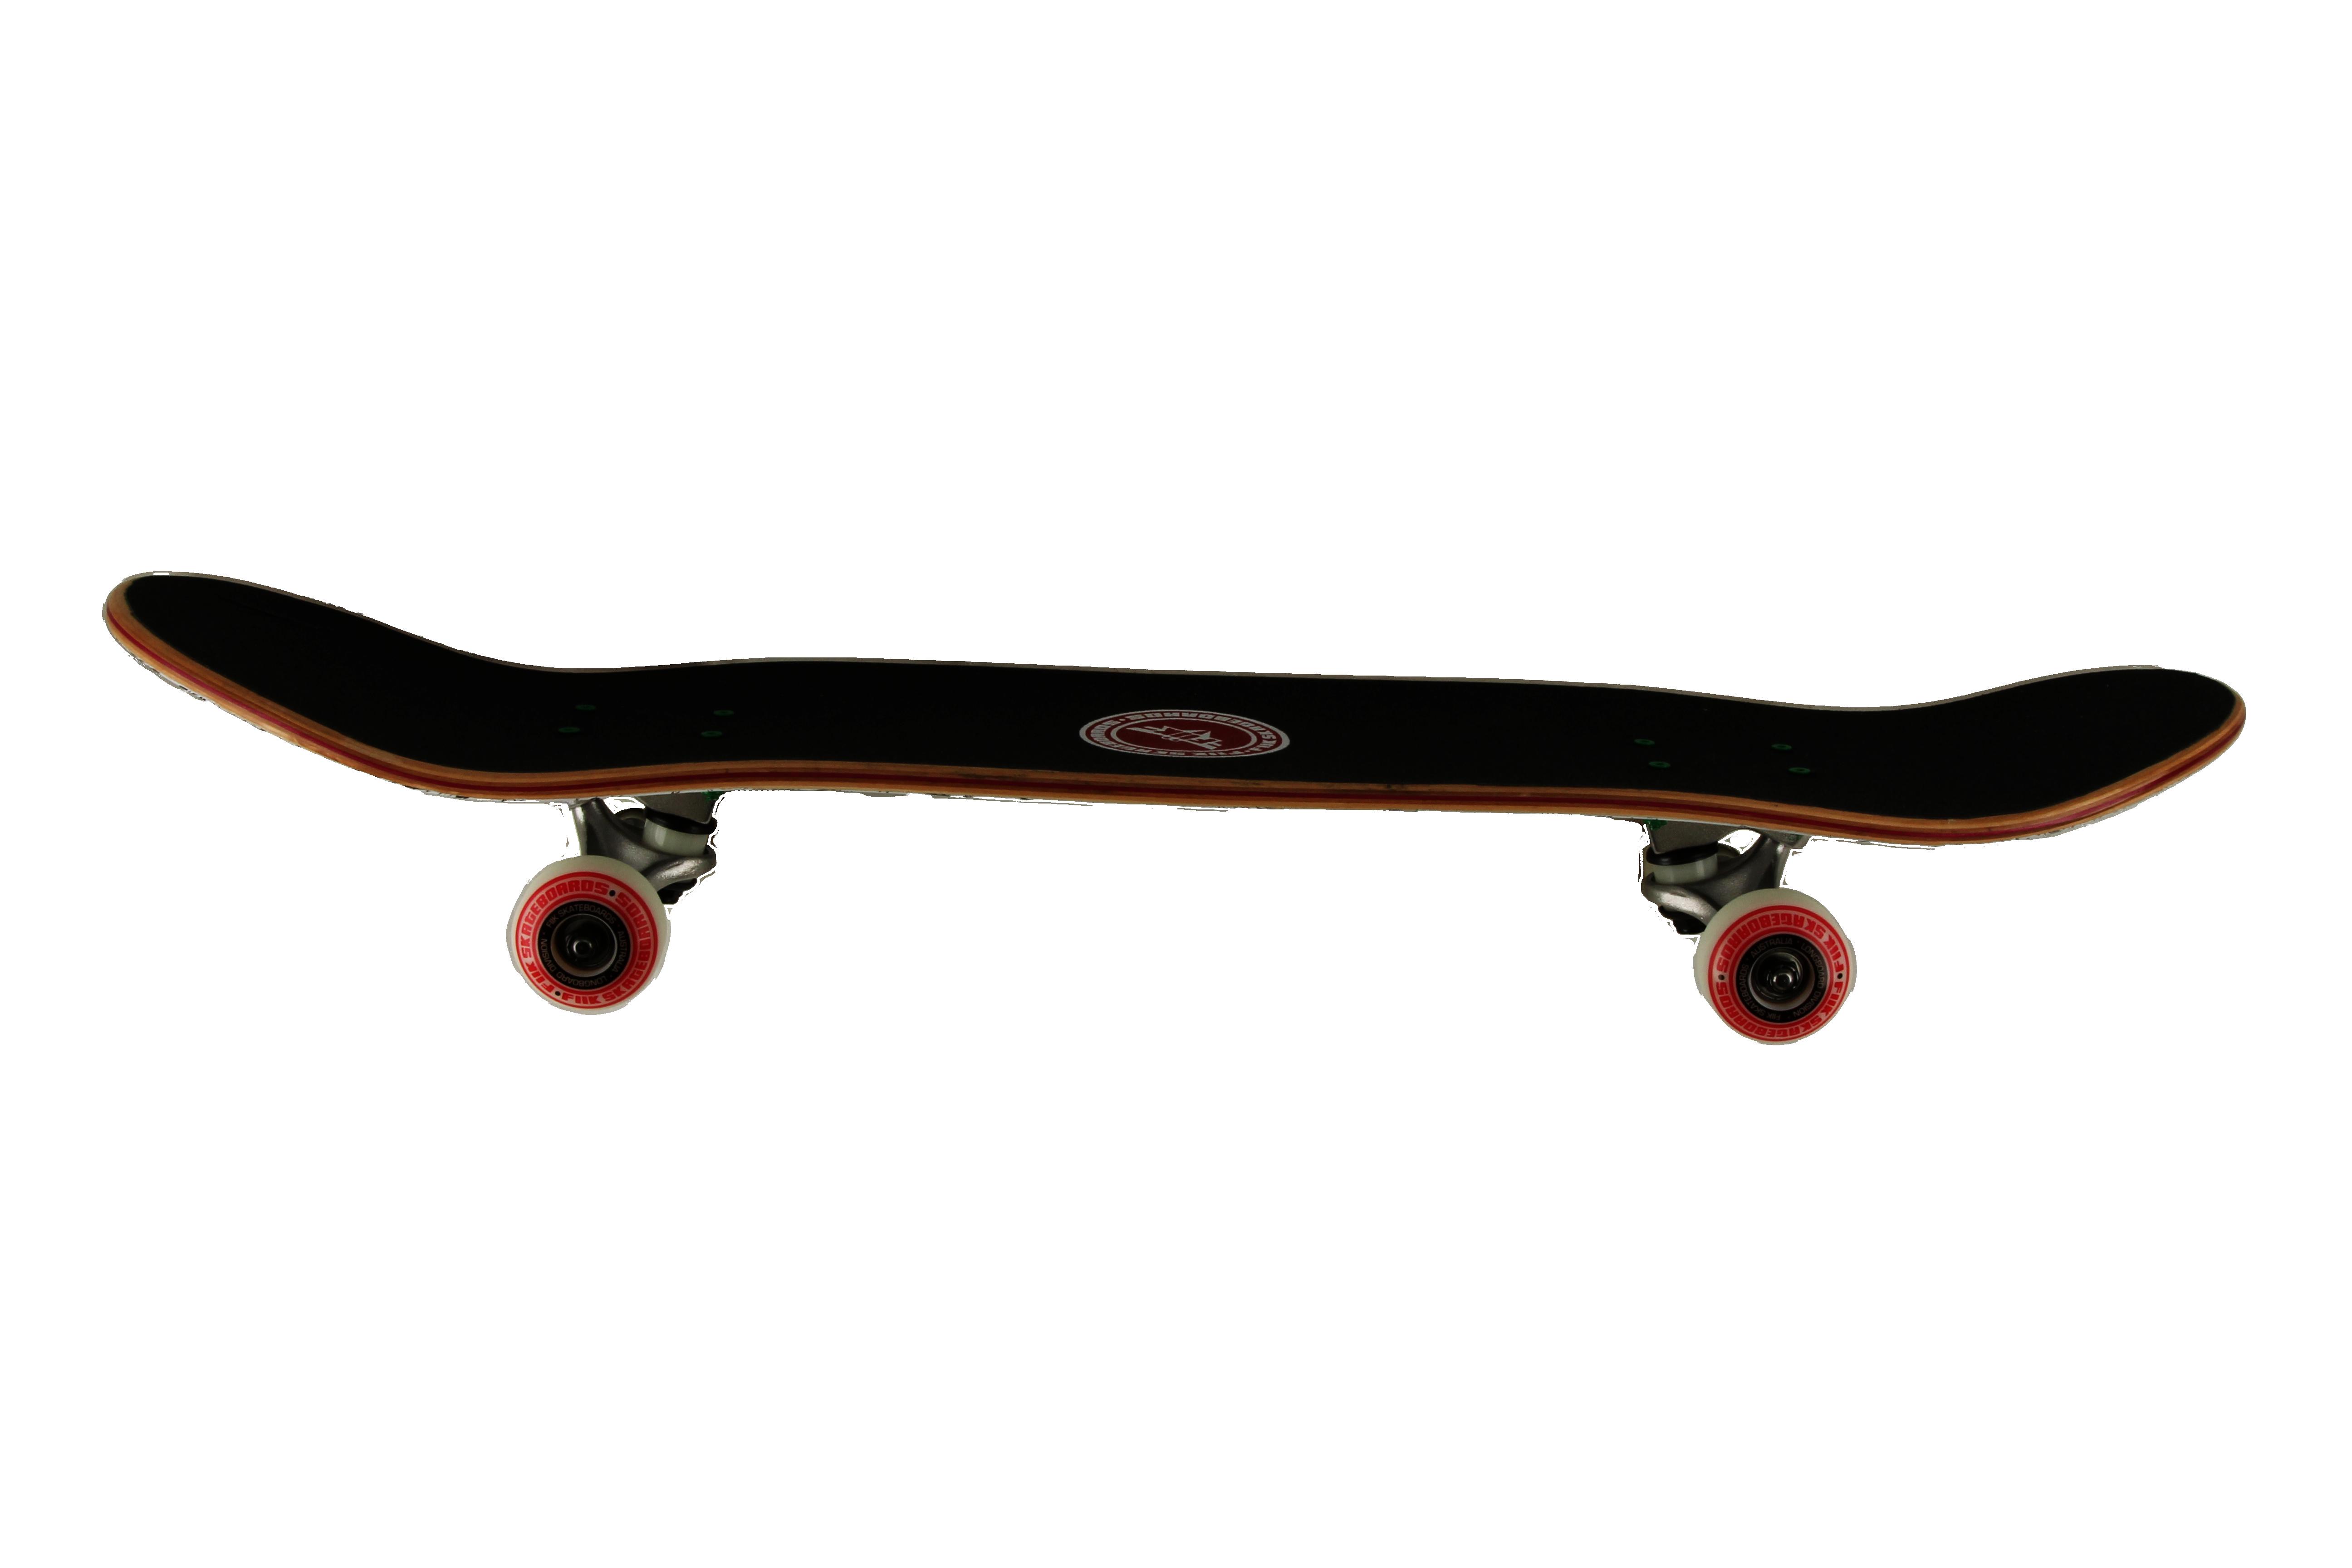 Skateboard HD PNG - 94086